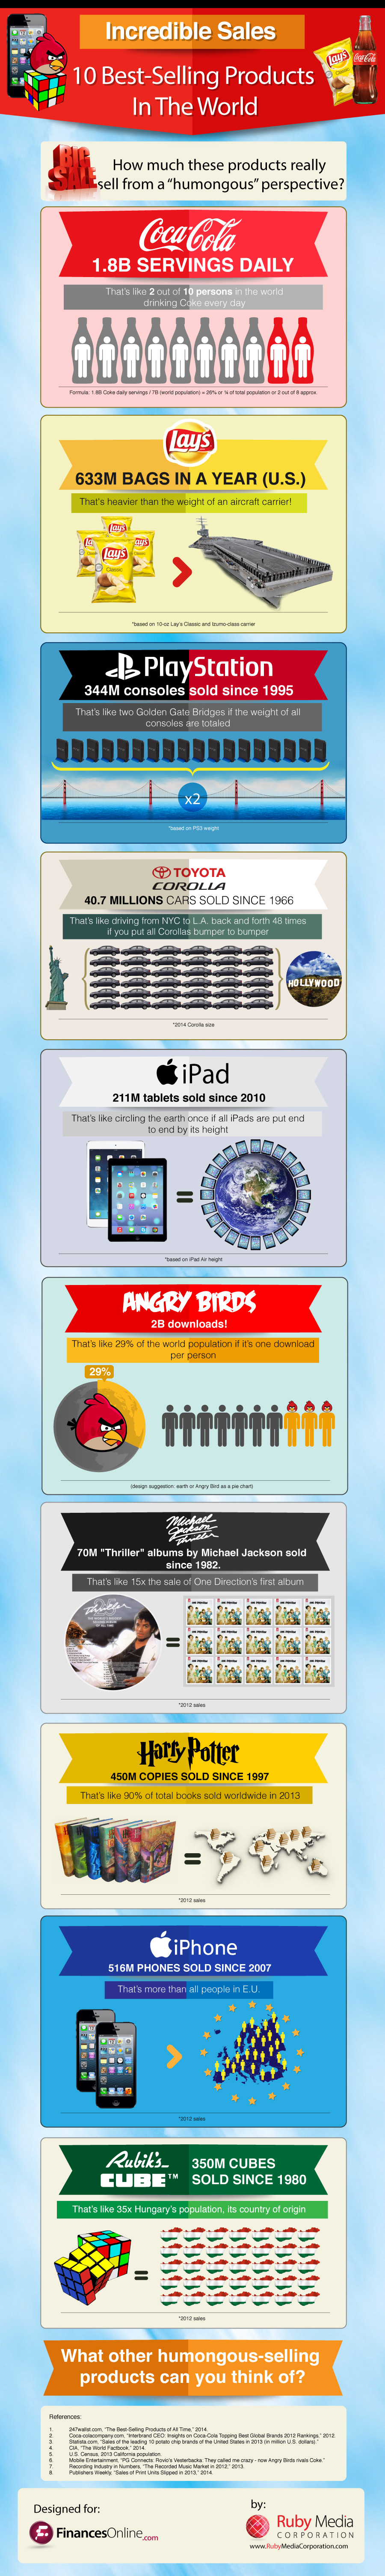 infografia productos mas vendidos de la historia